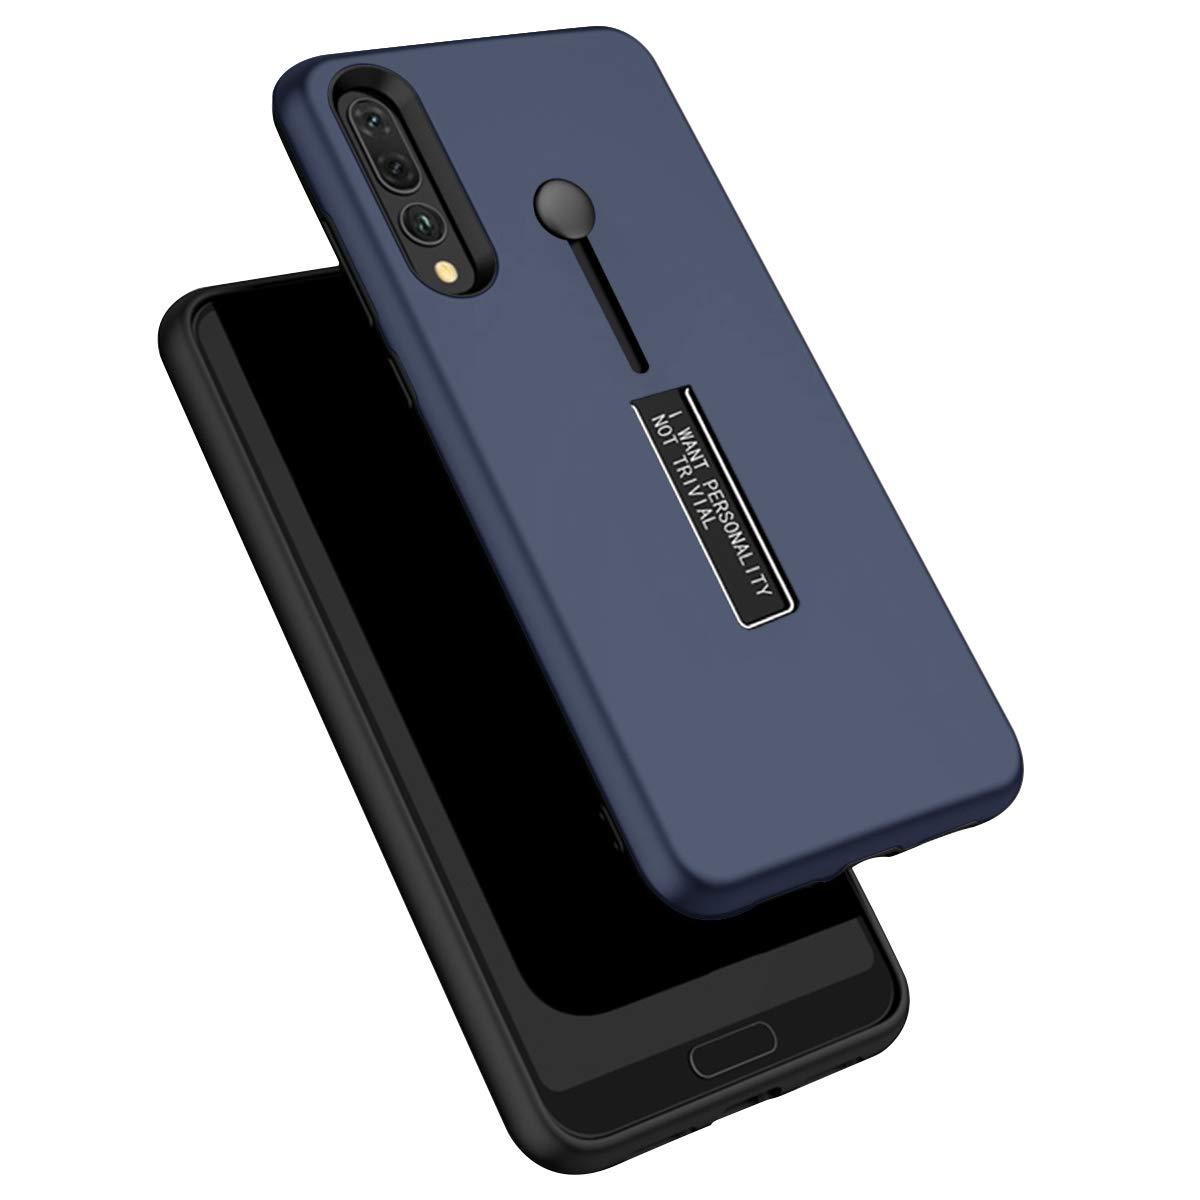 WIWJ Huawei P20 Pro H/ülle Case PC Backcover+TPU Silikon Mit Halterung und Ring Funktion Handy Schutzh/ülle Schutz Cover Schale Handyh/ülle f/ür Huawei P20 Pro-Schwarz